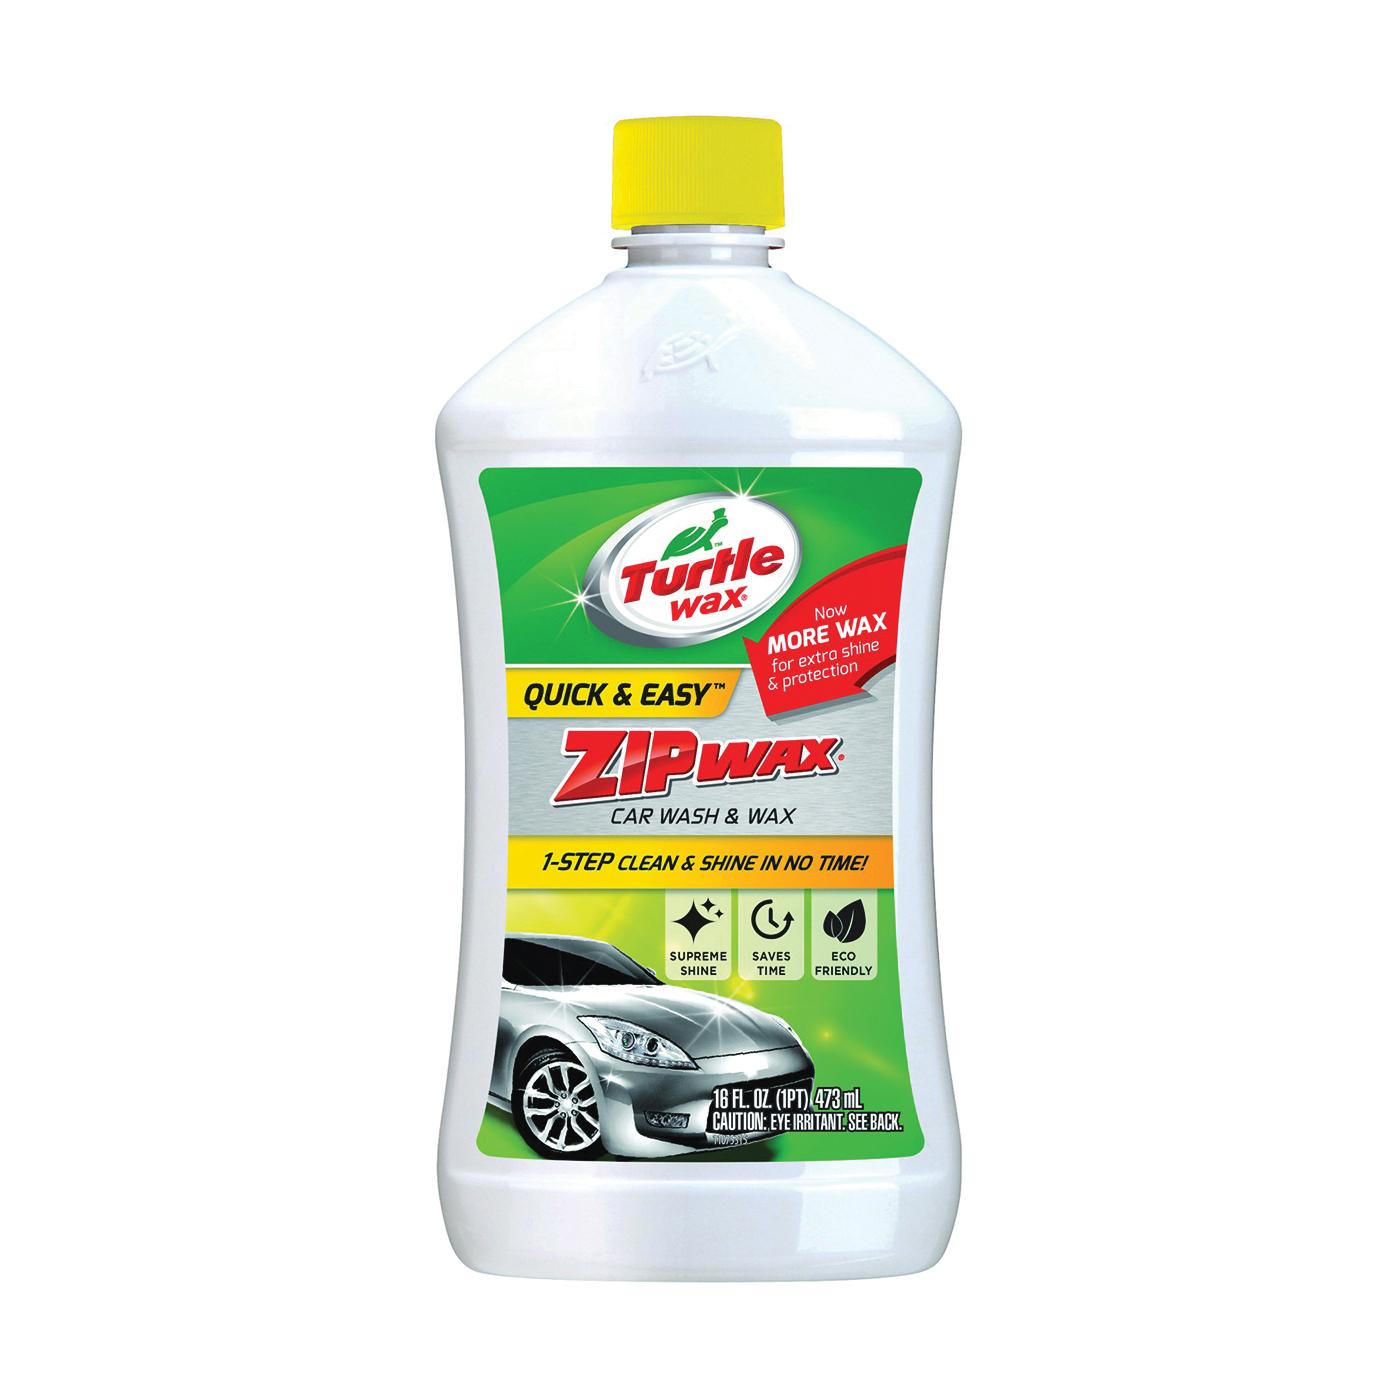 Picture of Turtle Wax Quick & Easy T75 Car Wash Concentrate, 16 fl-oz Package, Bottle, Liquid, Lemon